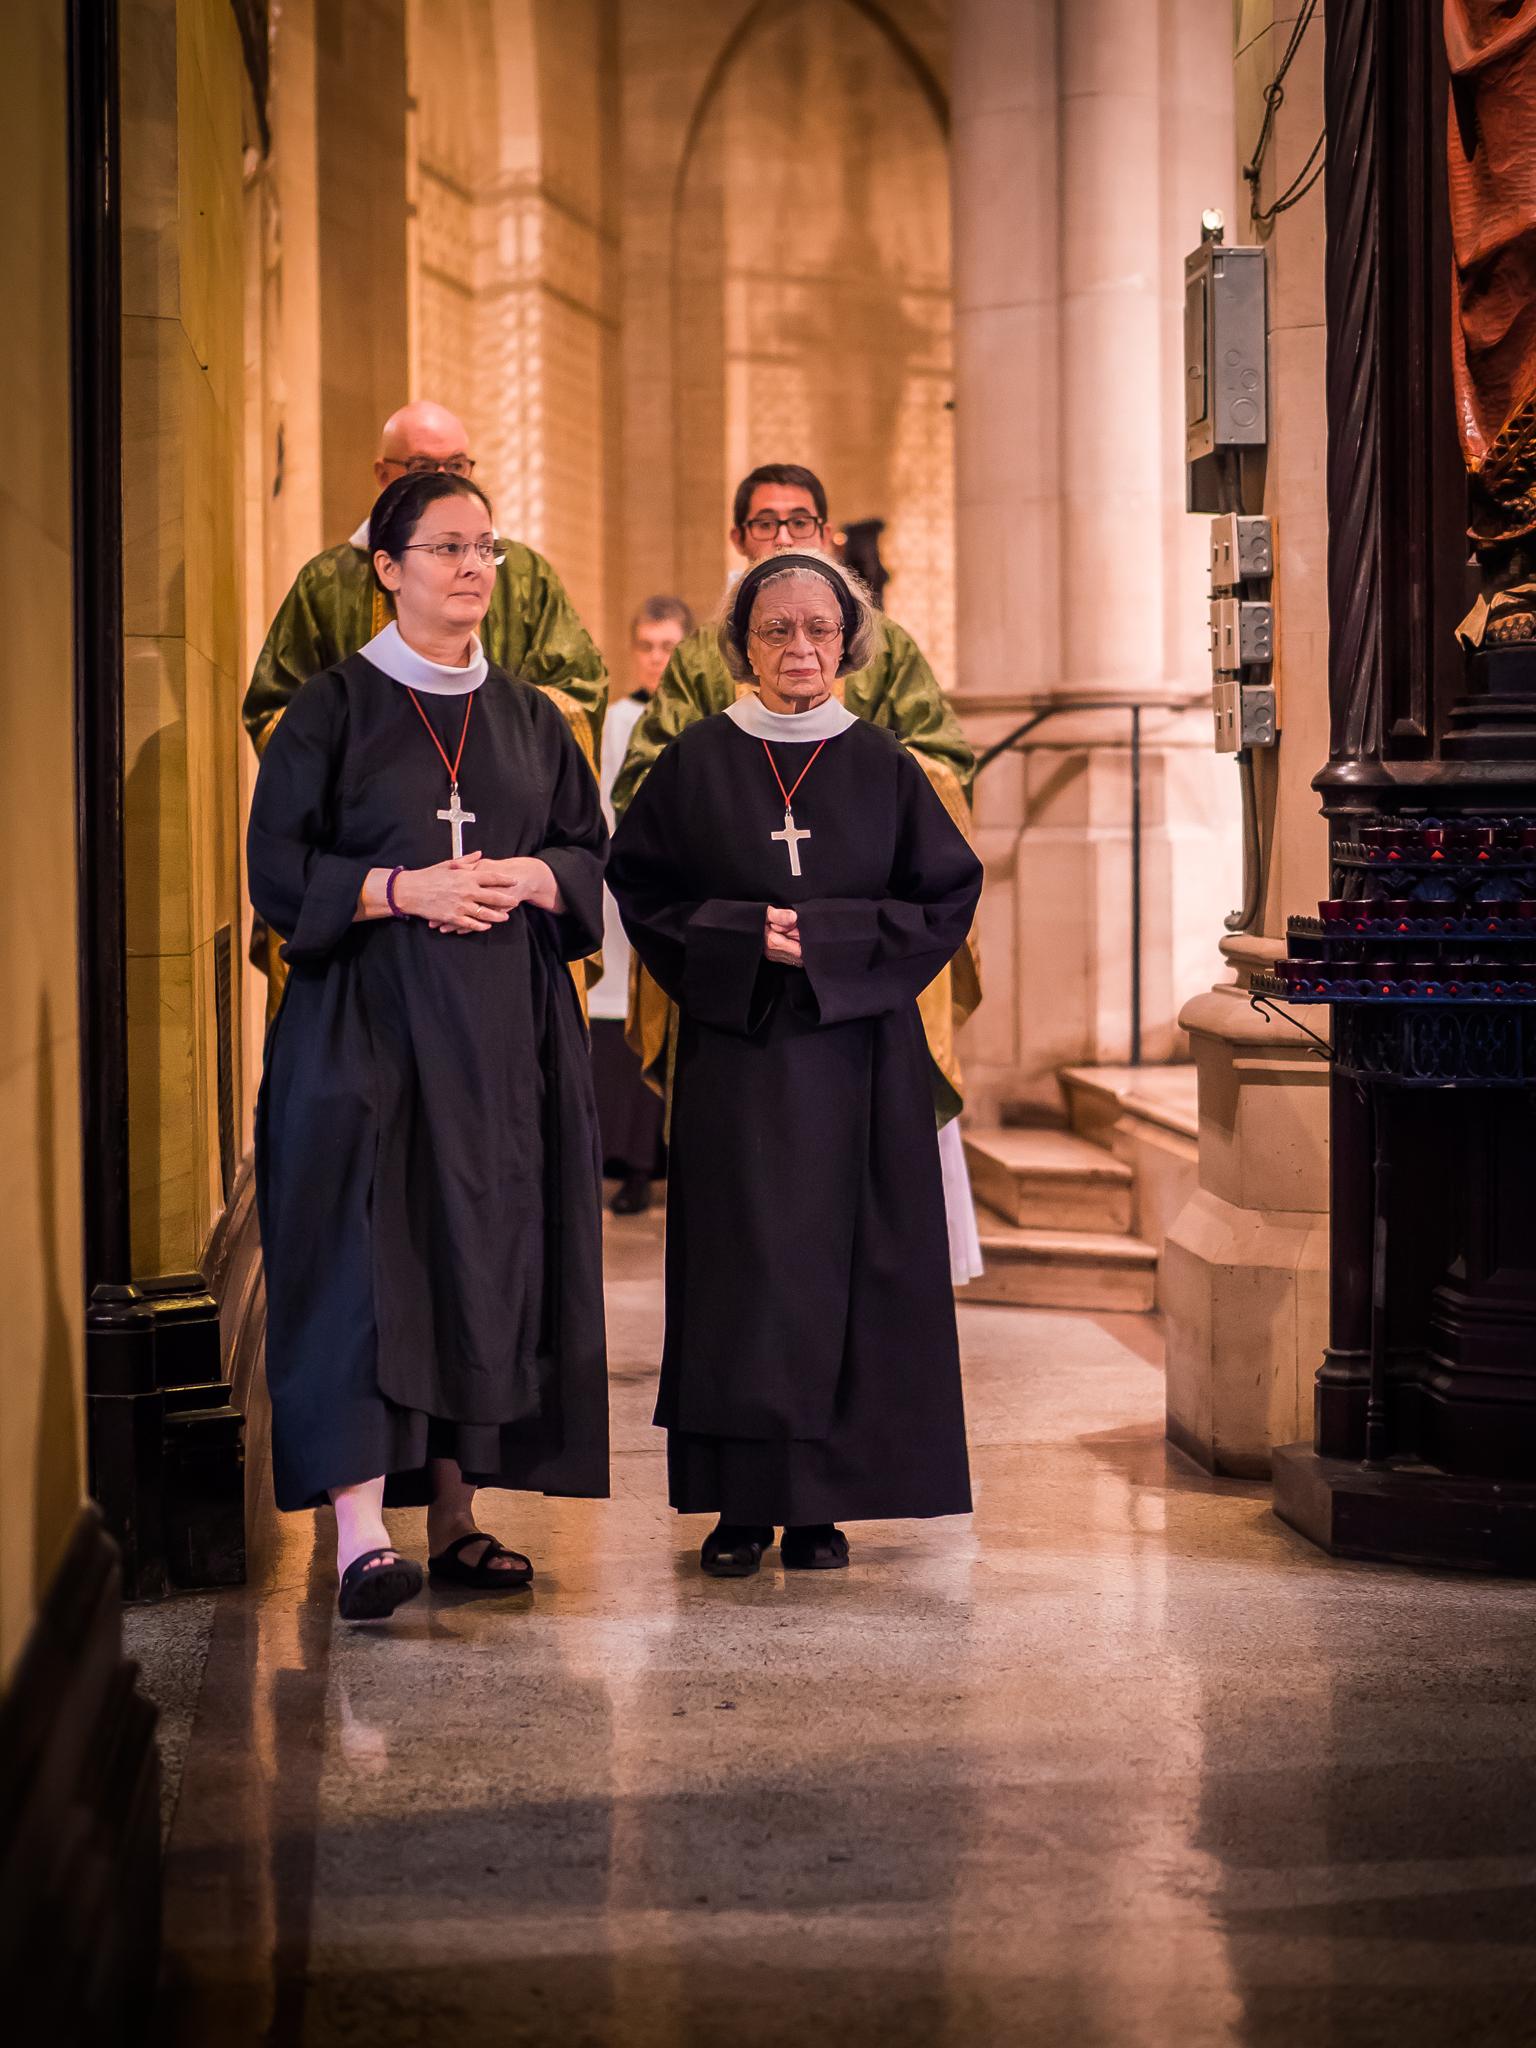 Sr. Monica Clare, C.S.J.B. (L) and Sr. Laura Katharine, C.S.J.B., Sunday, August 5, 2018   Photo by Ricardo Gomez